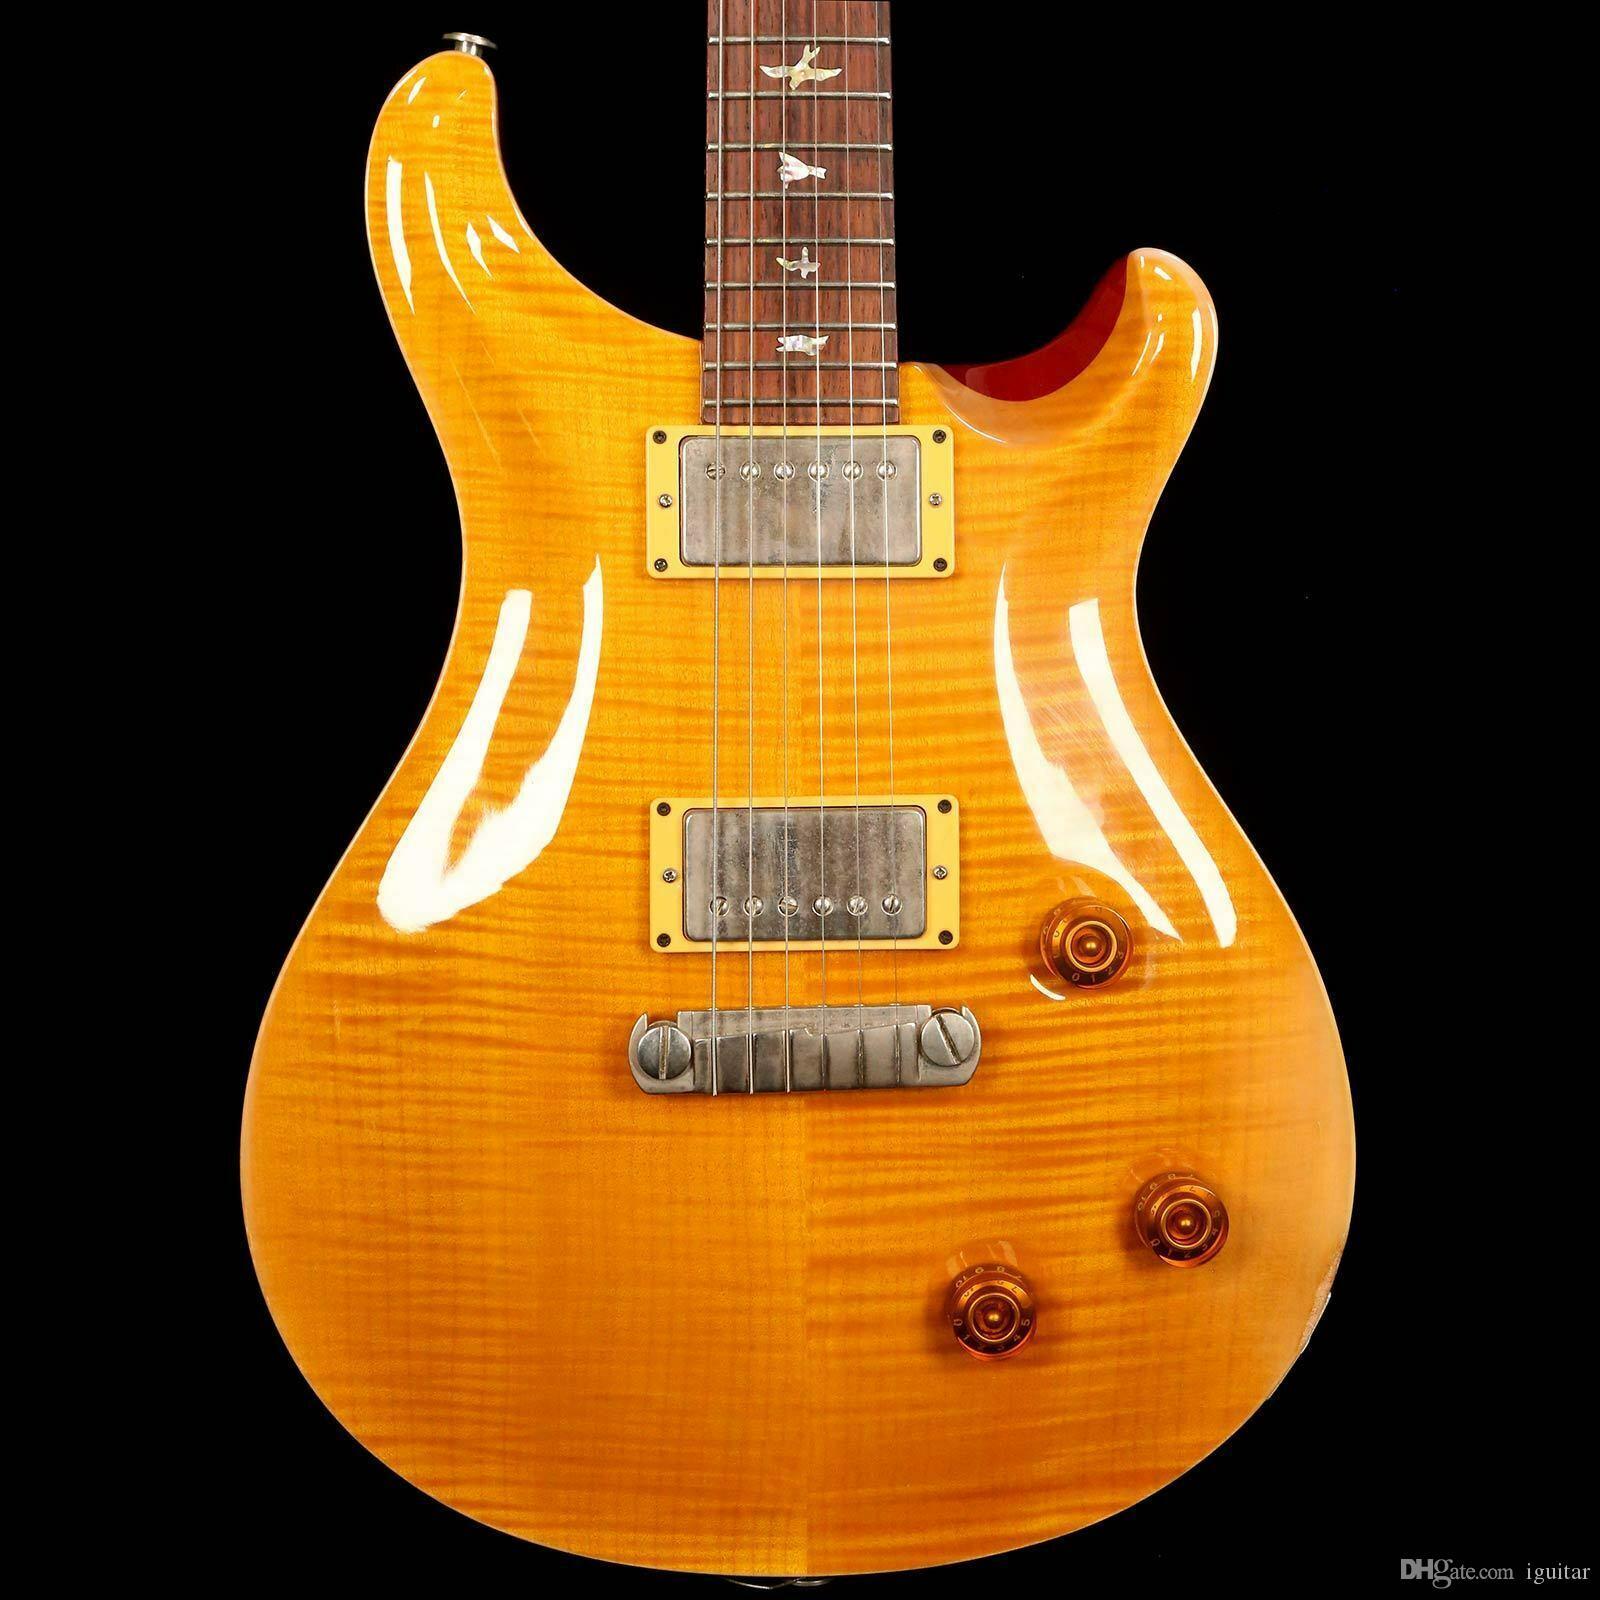 Rare Custom 22 10 Top Electric Guitar Yellow Burst Reed Smith 22 frets Guitar